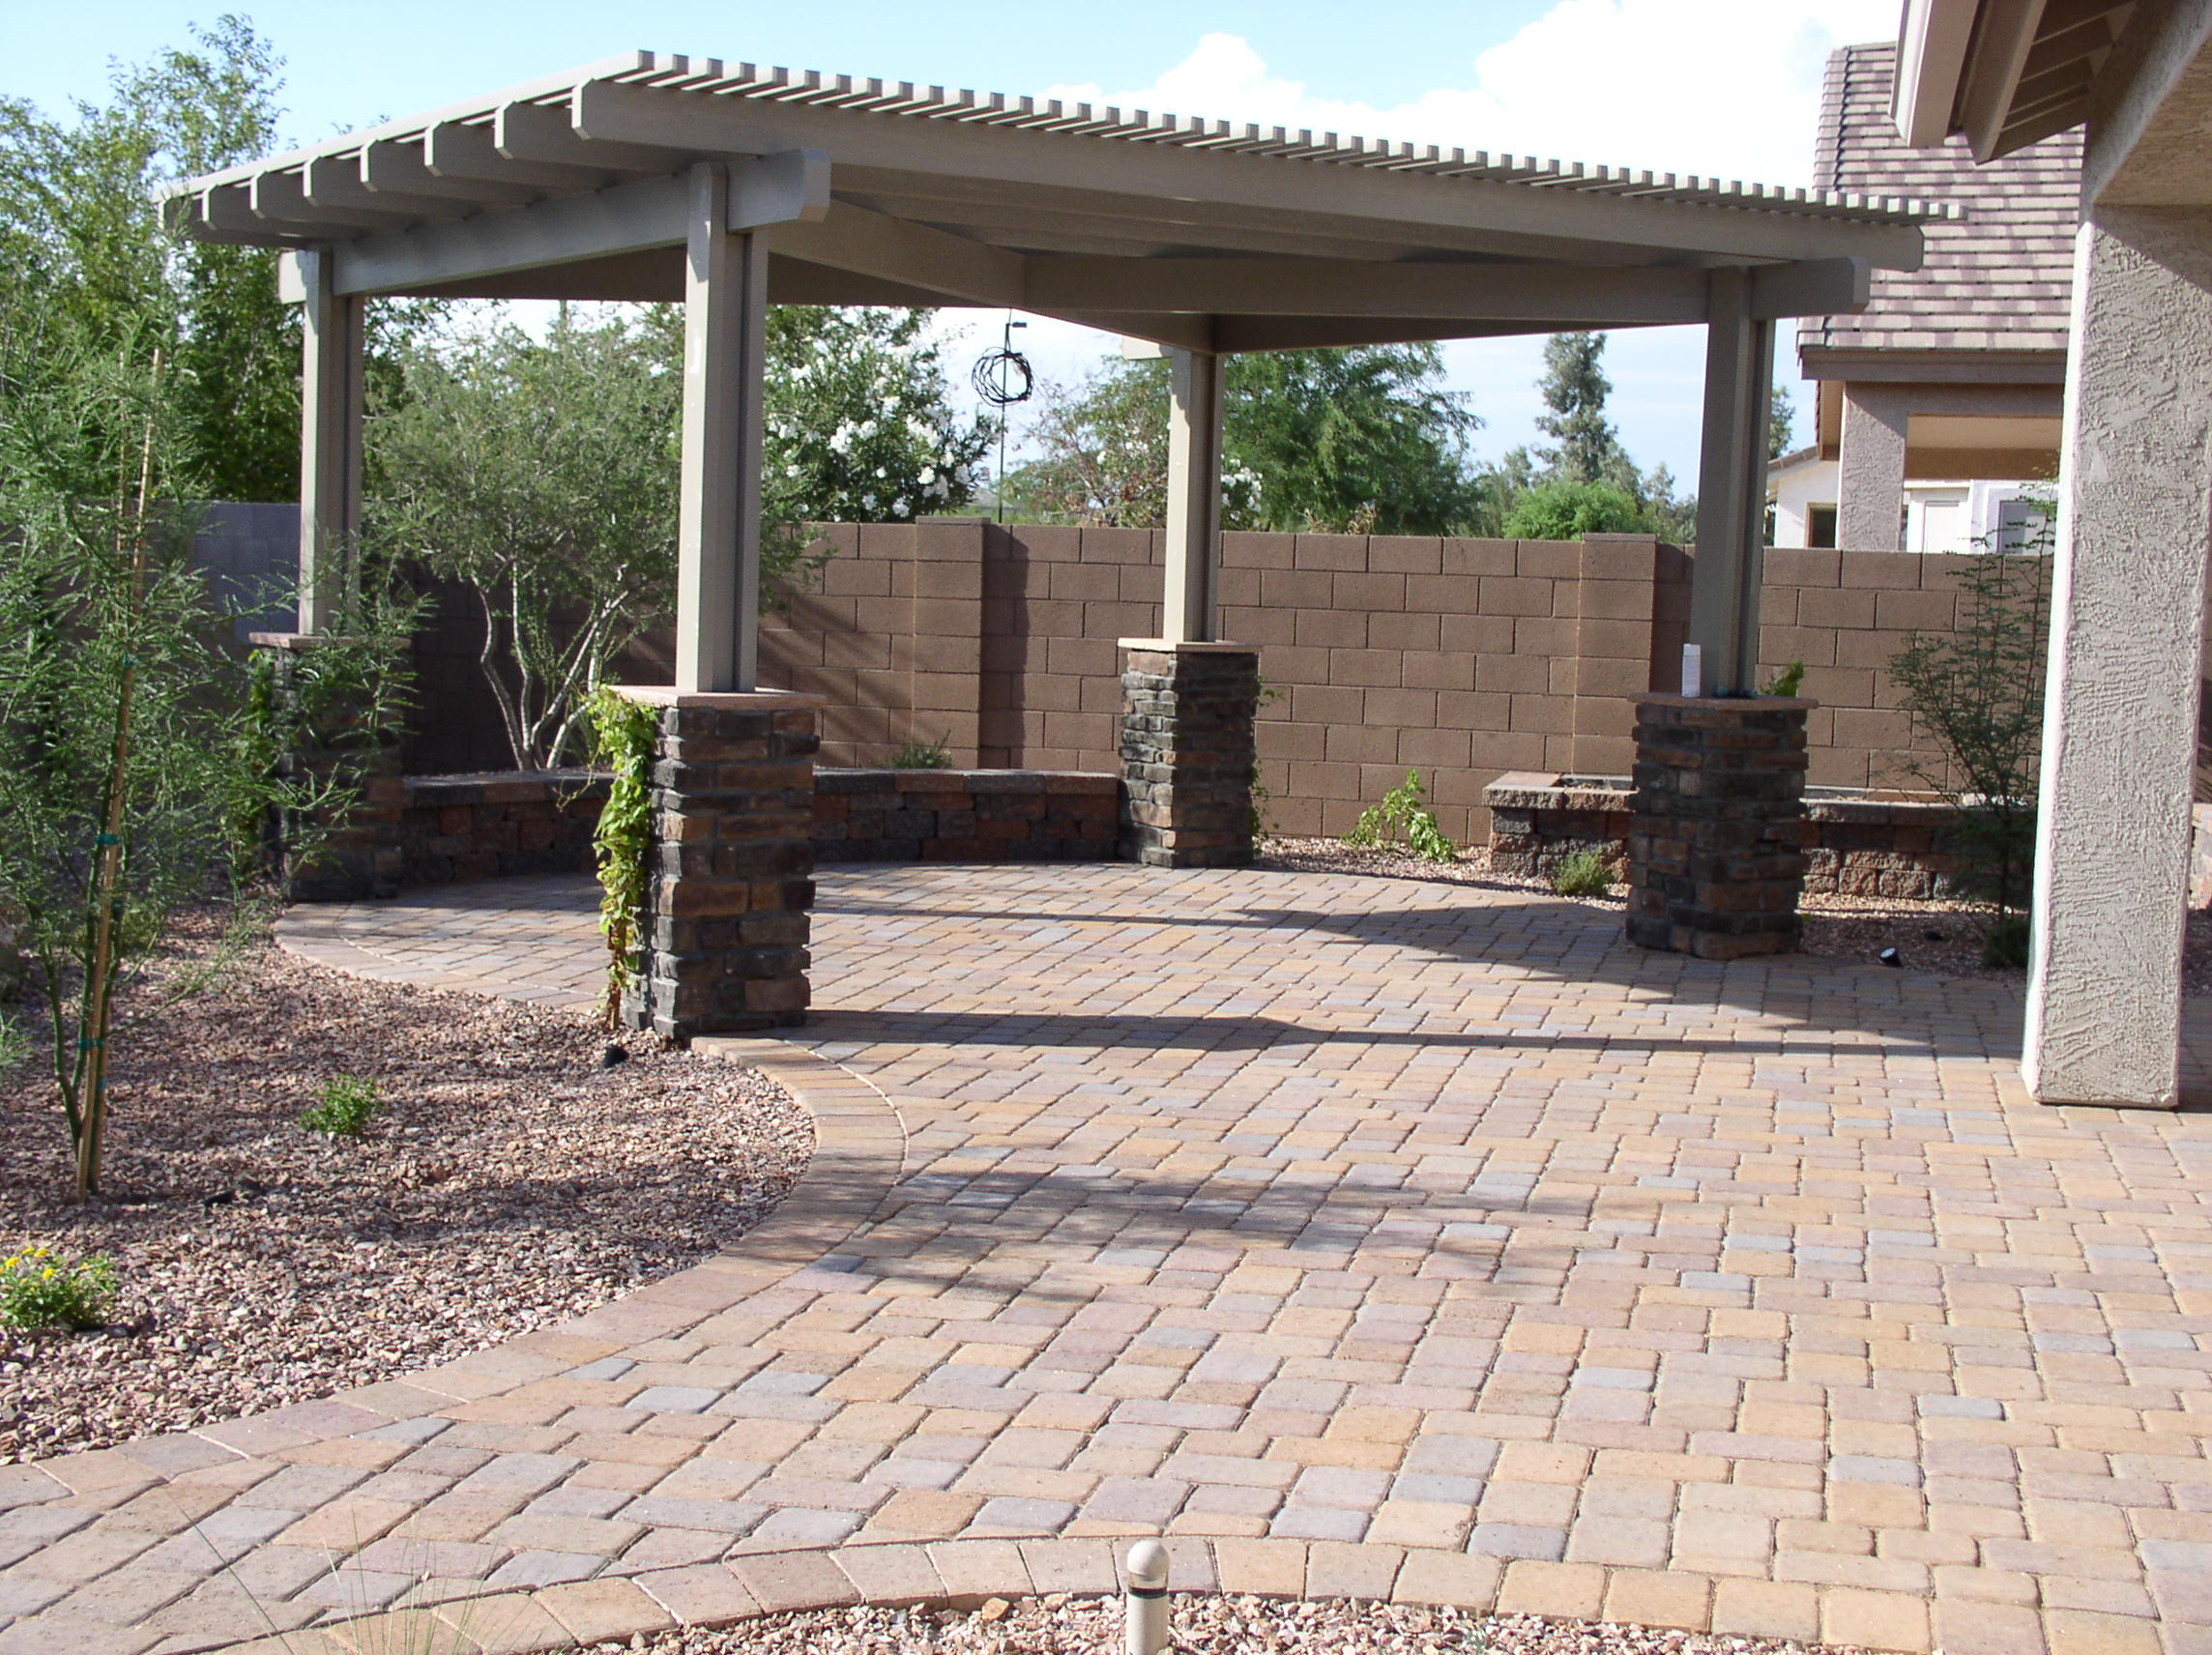 Backyard Patio Paver Design Ideas  Paver Designs and Paver Ideas for Your Backyard Patios